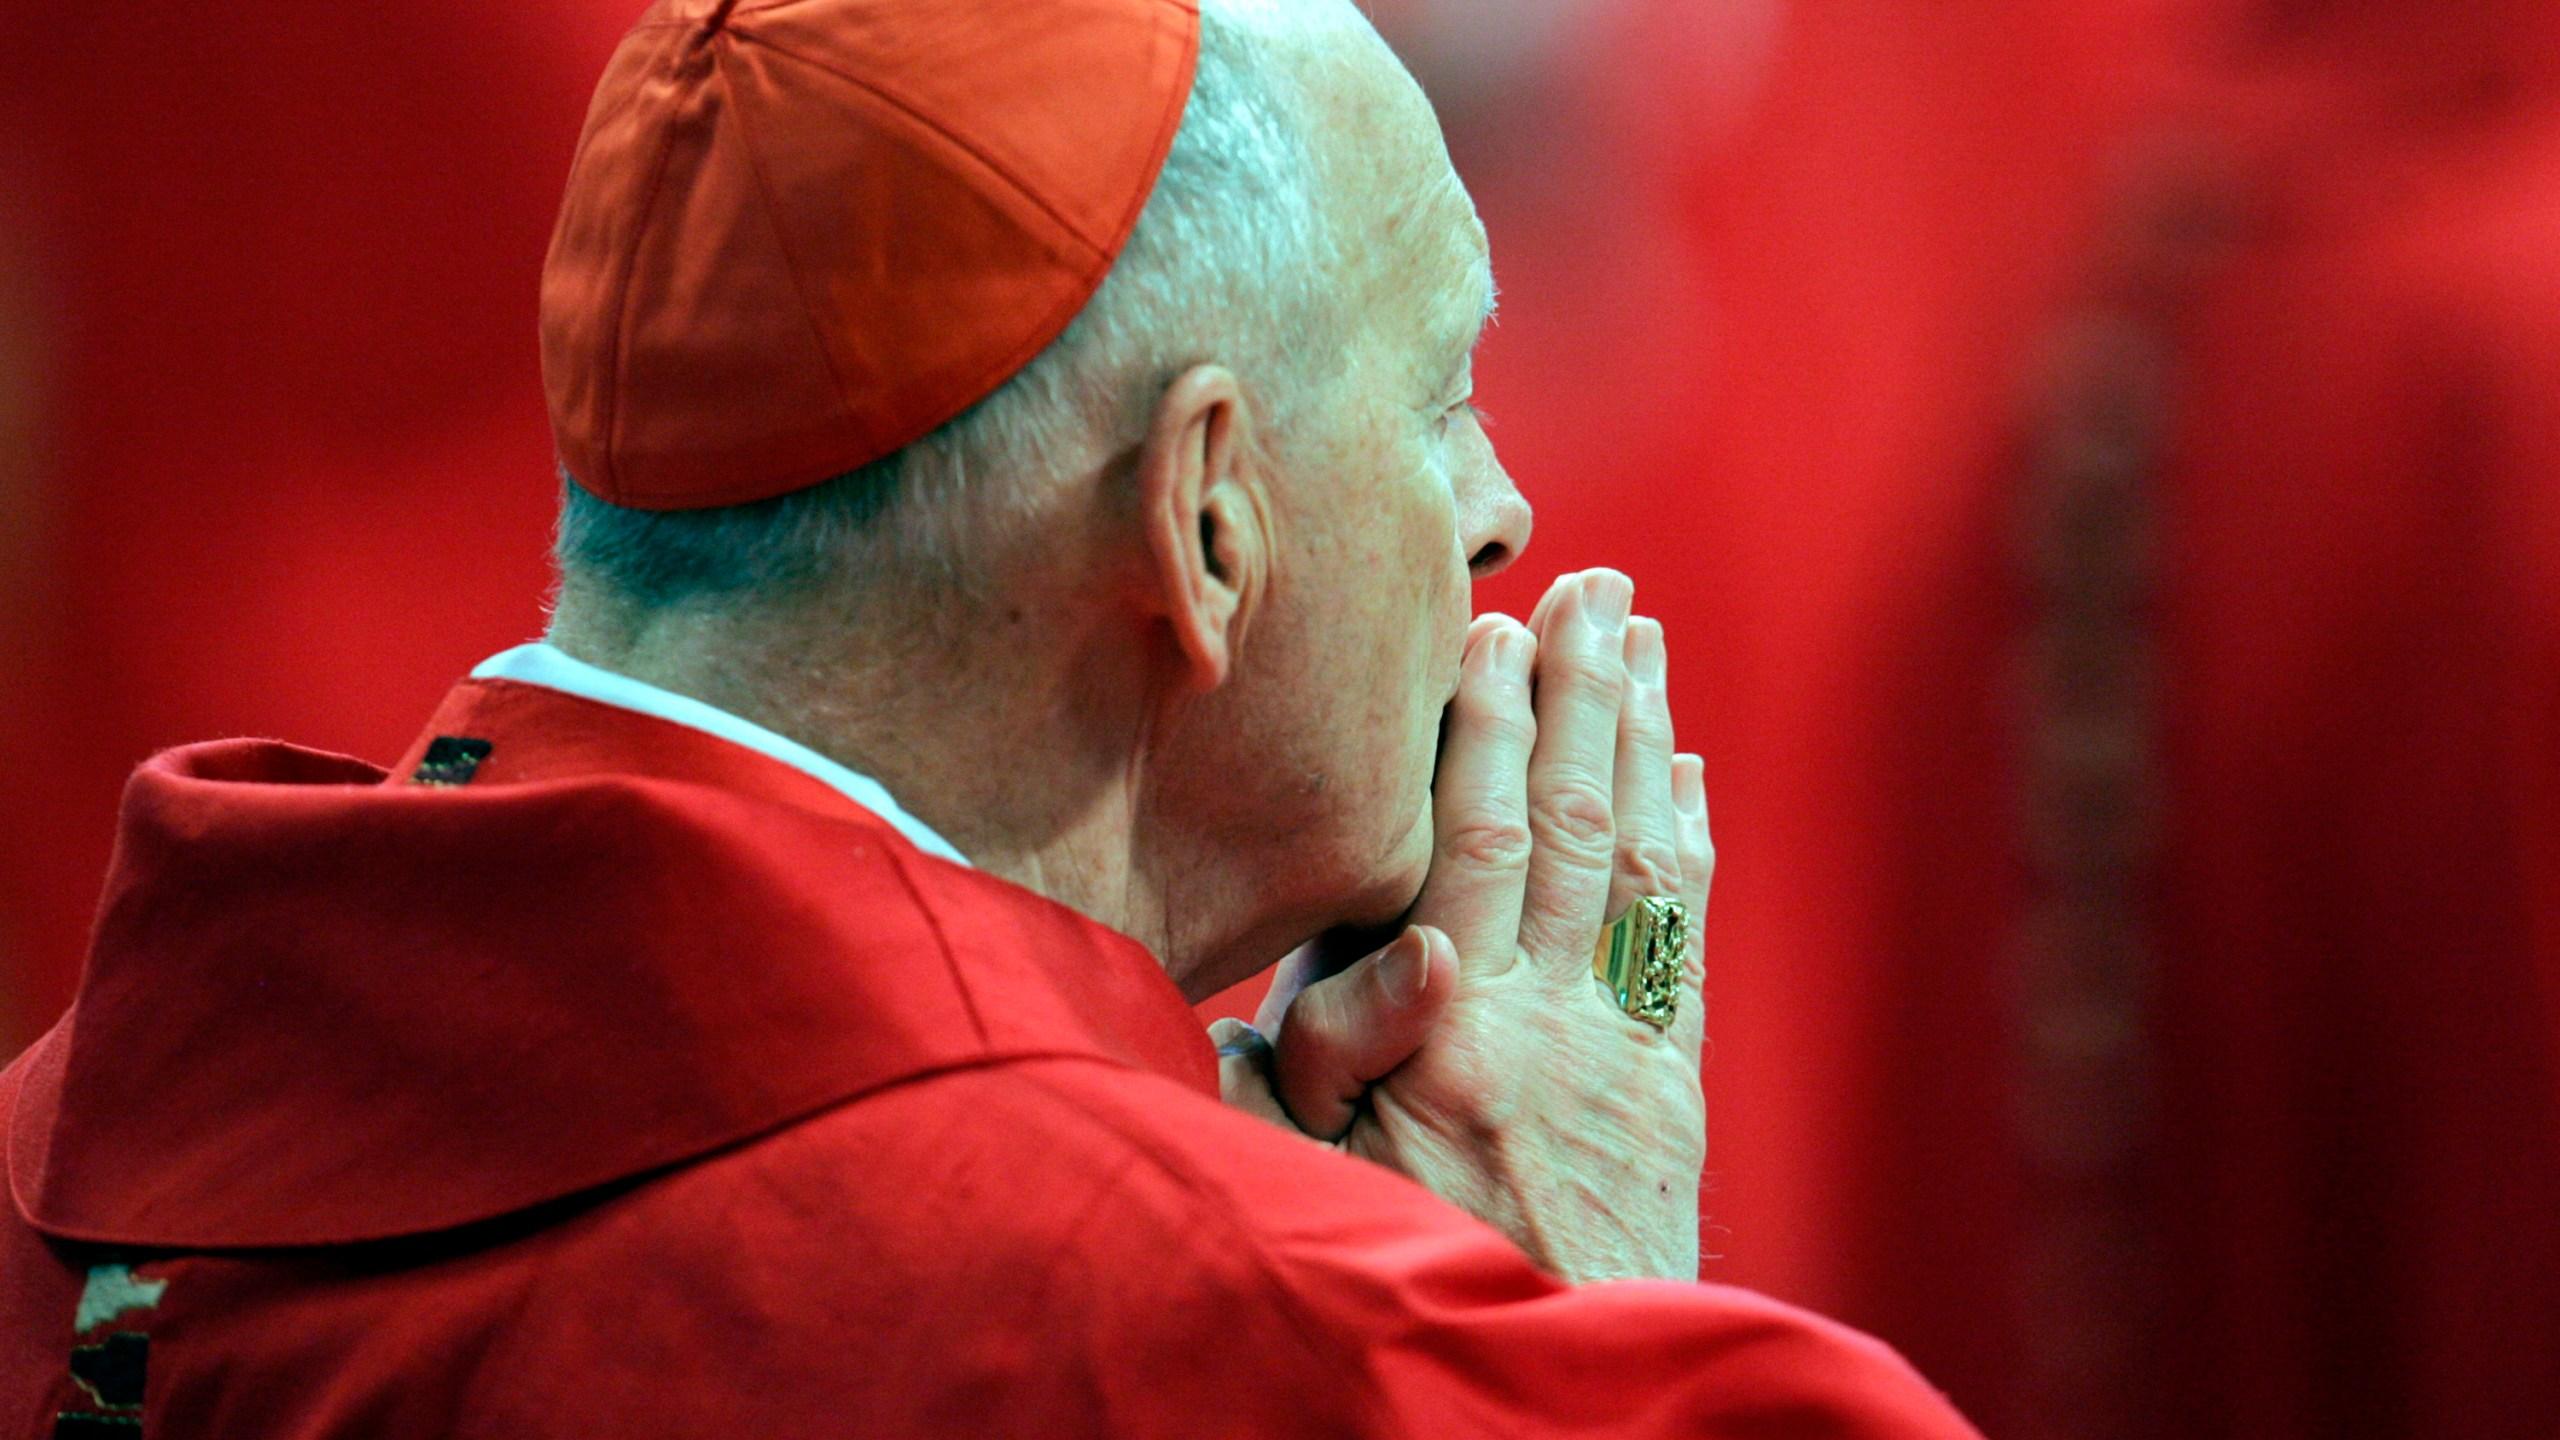 Vatican US Church Abuse_1550328601425